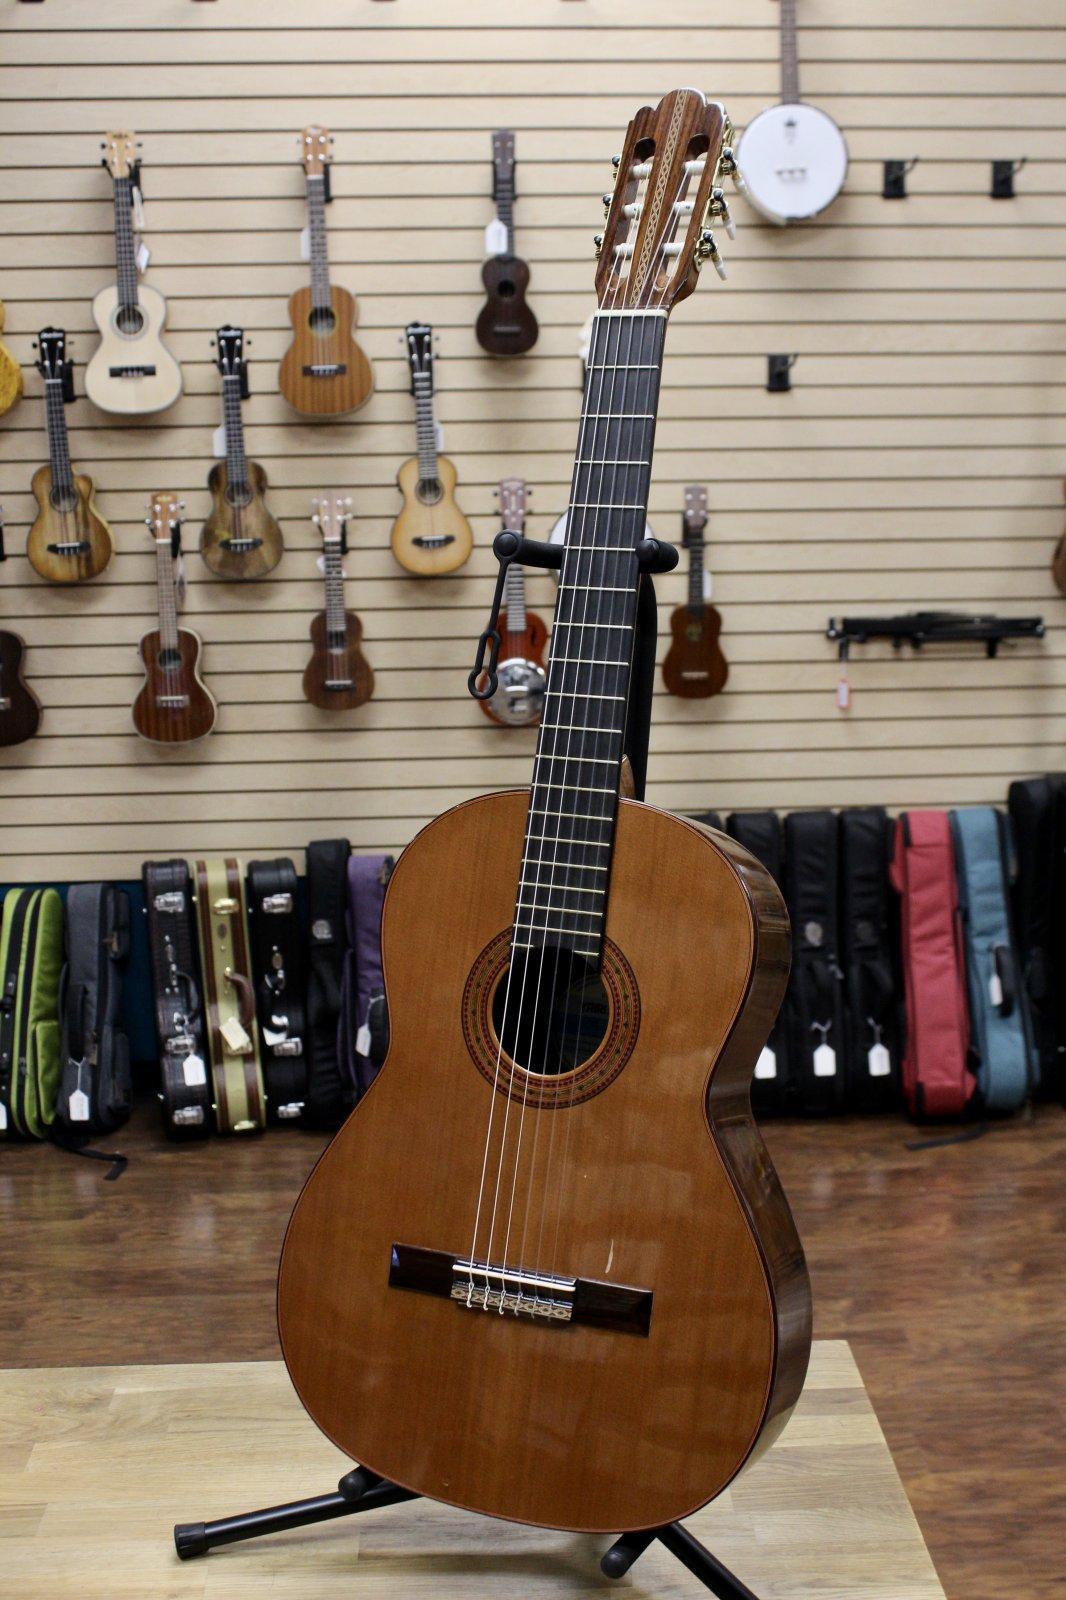 Preowned Yairi & Sons Classical Guitar